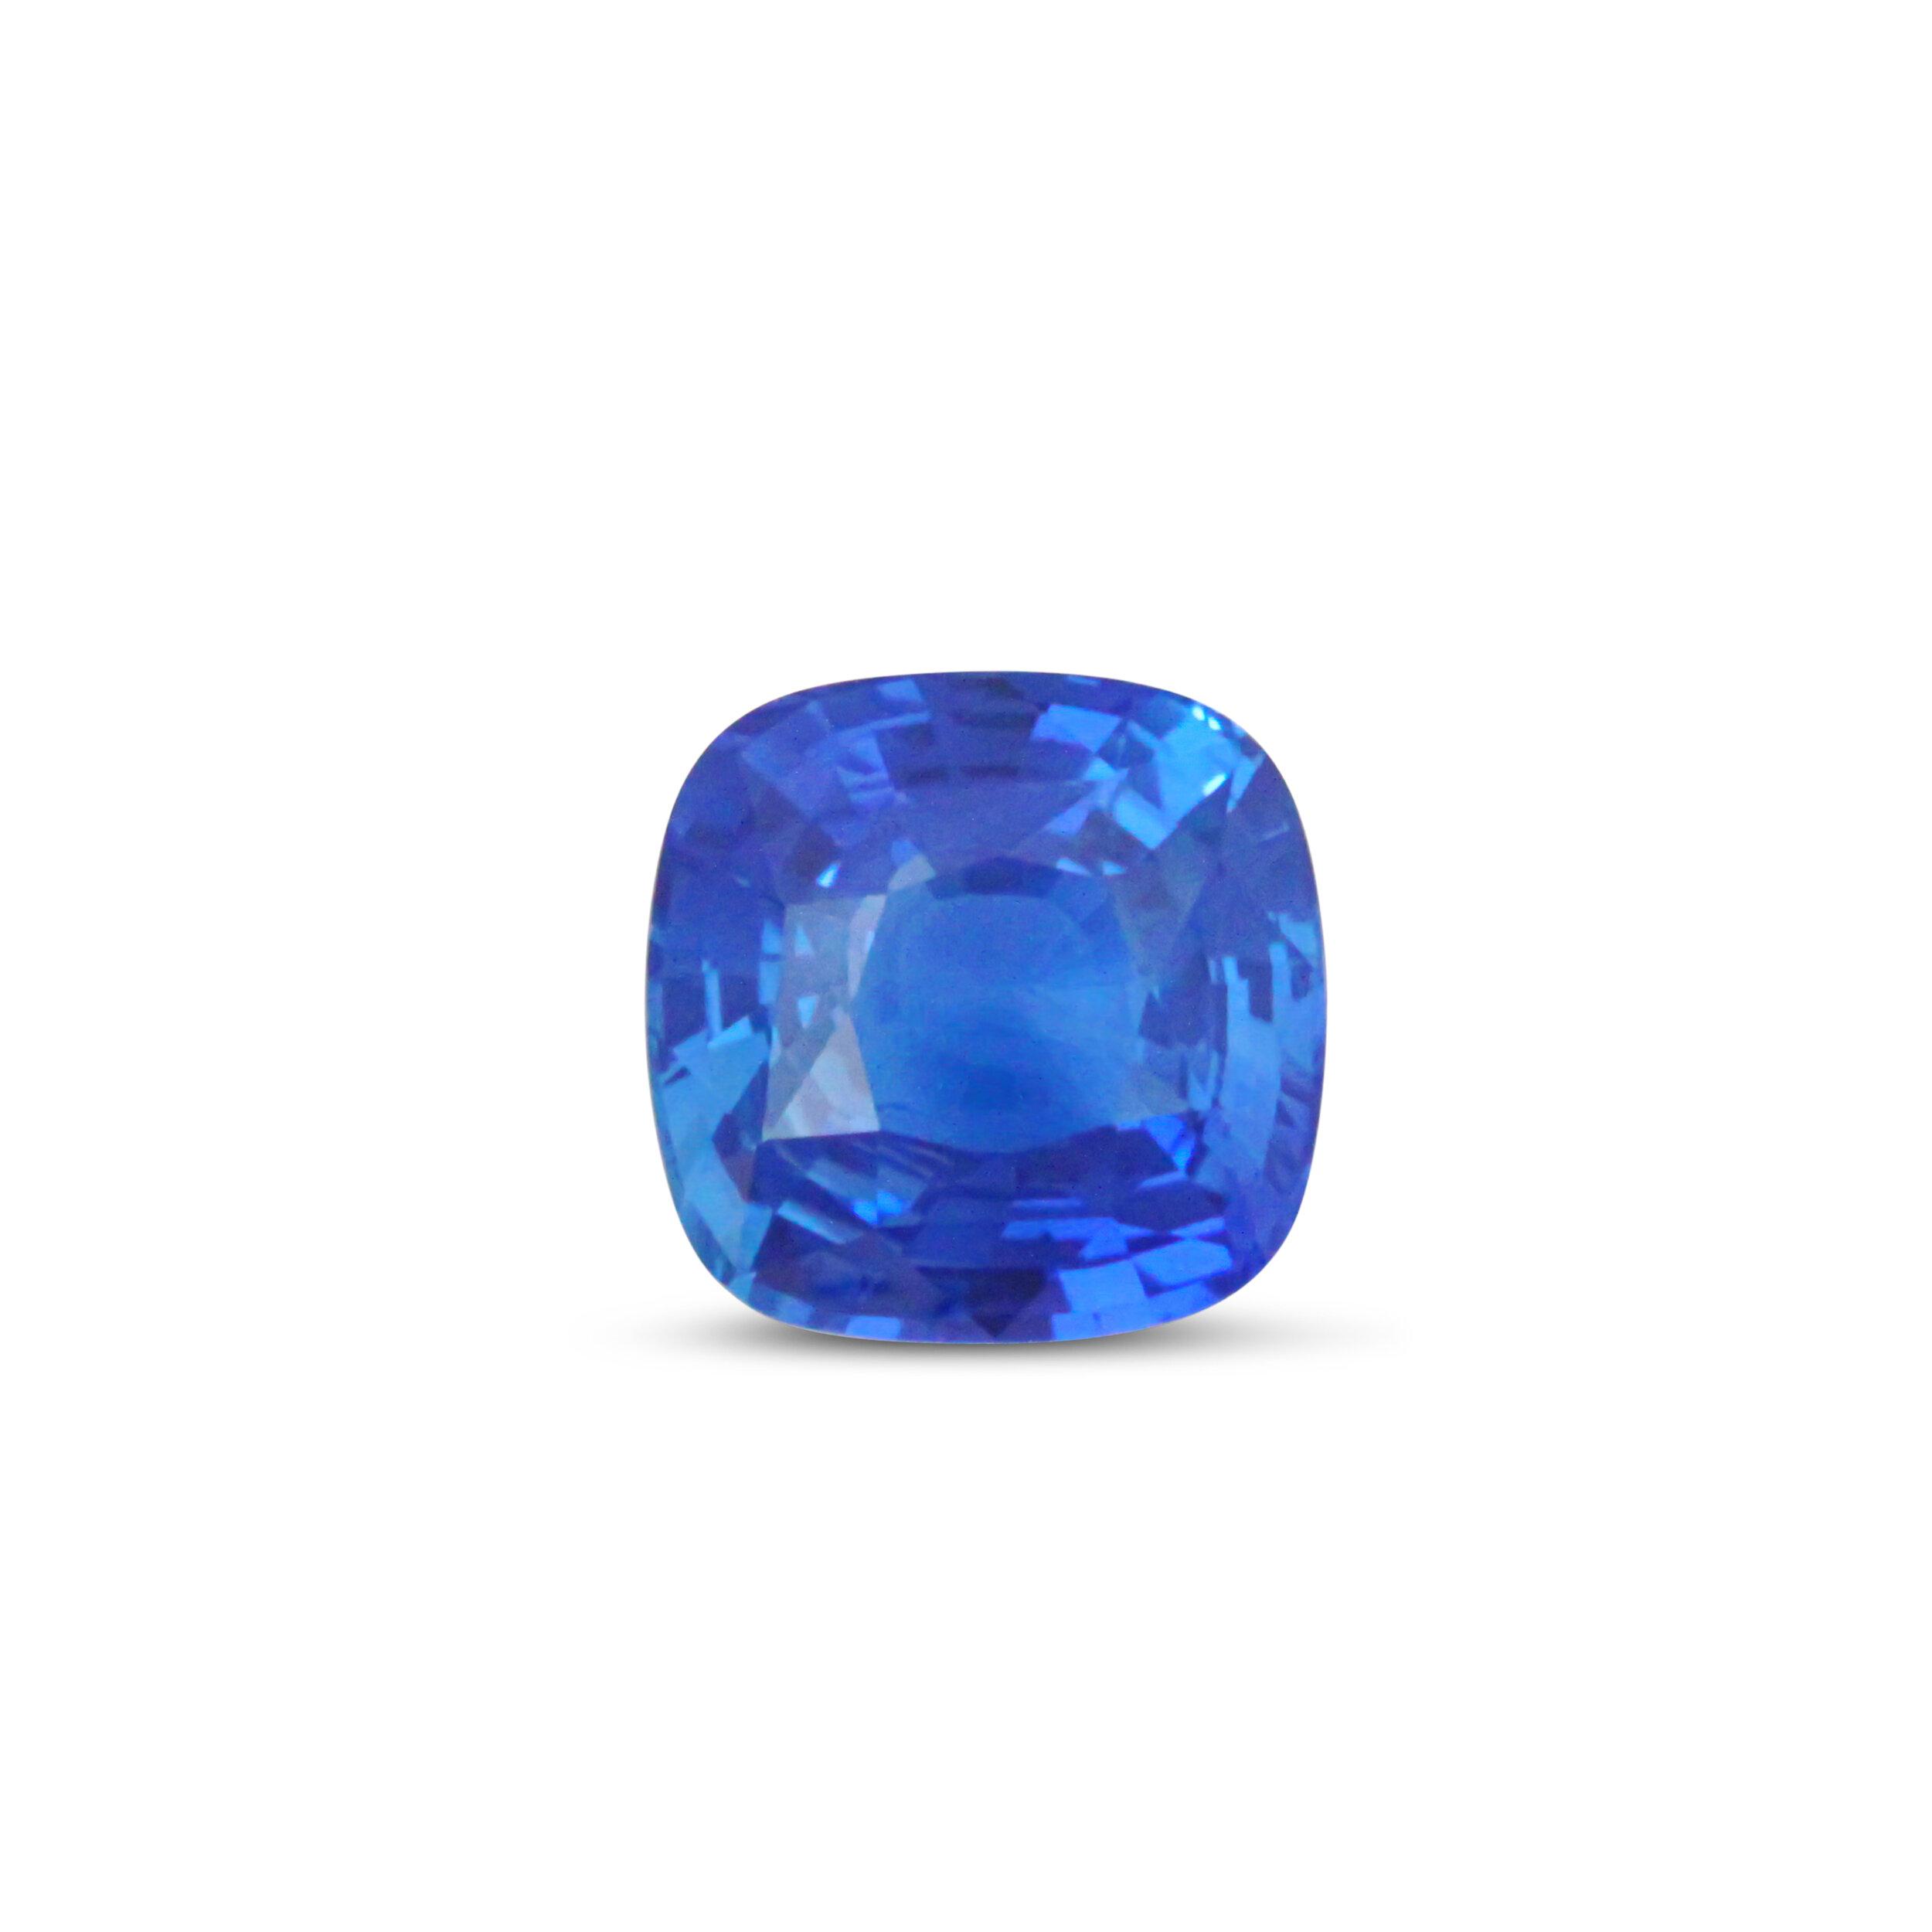 2 ct Unheated Ceylon Sapphire, C. Dunaigre